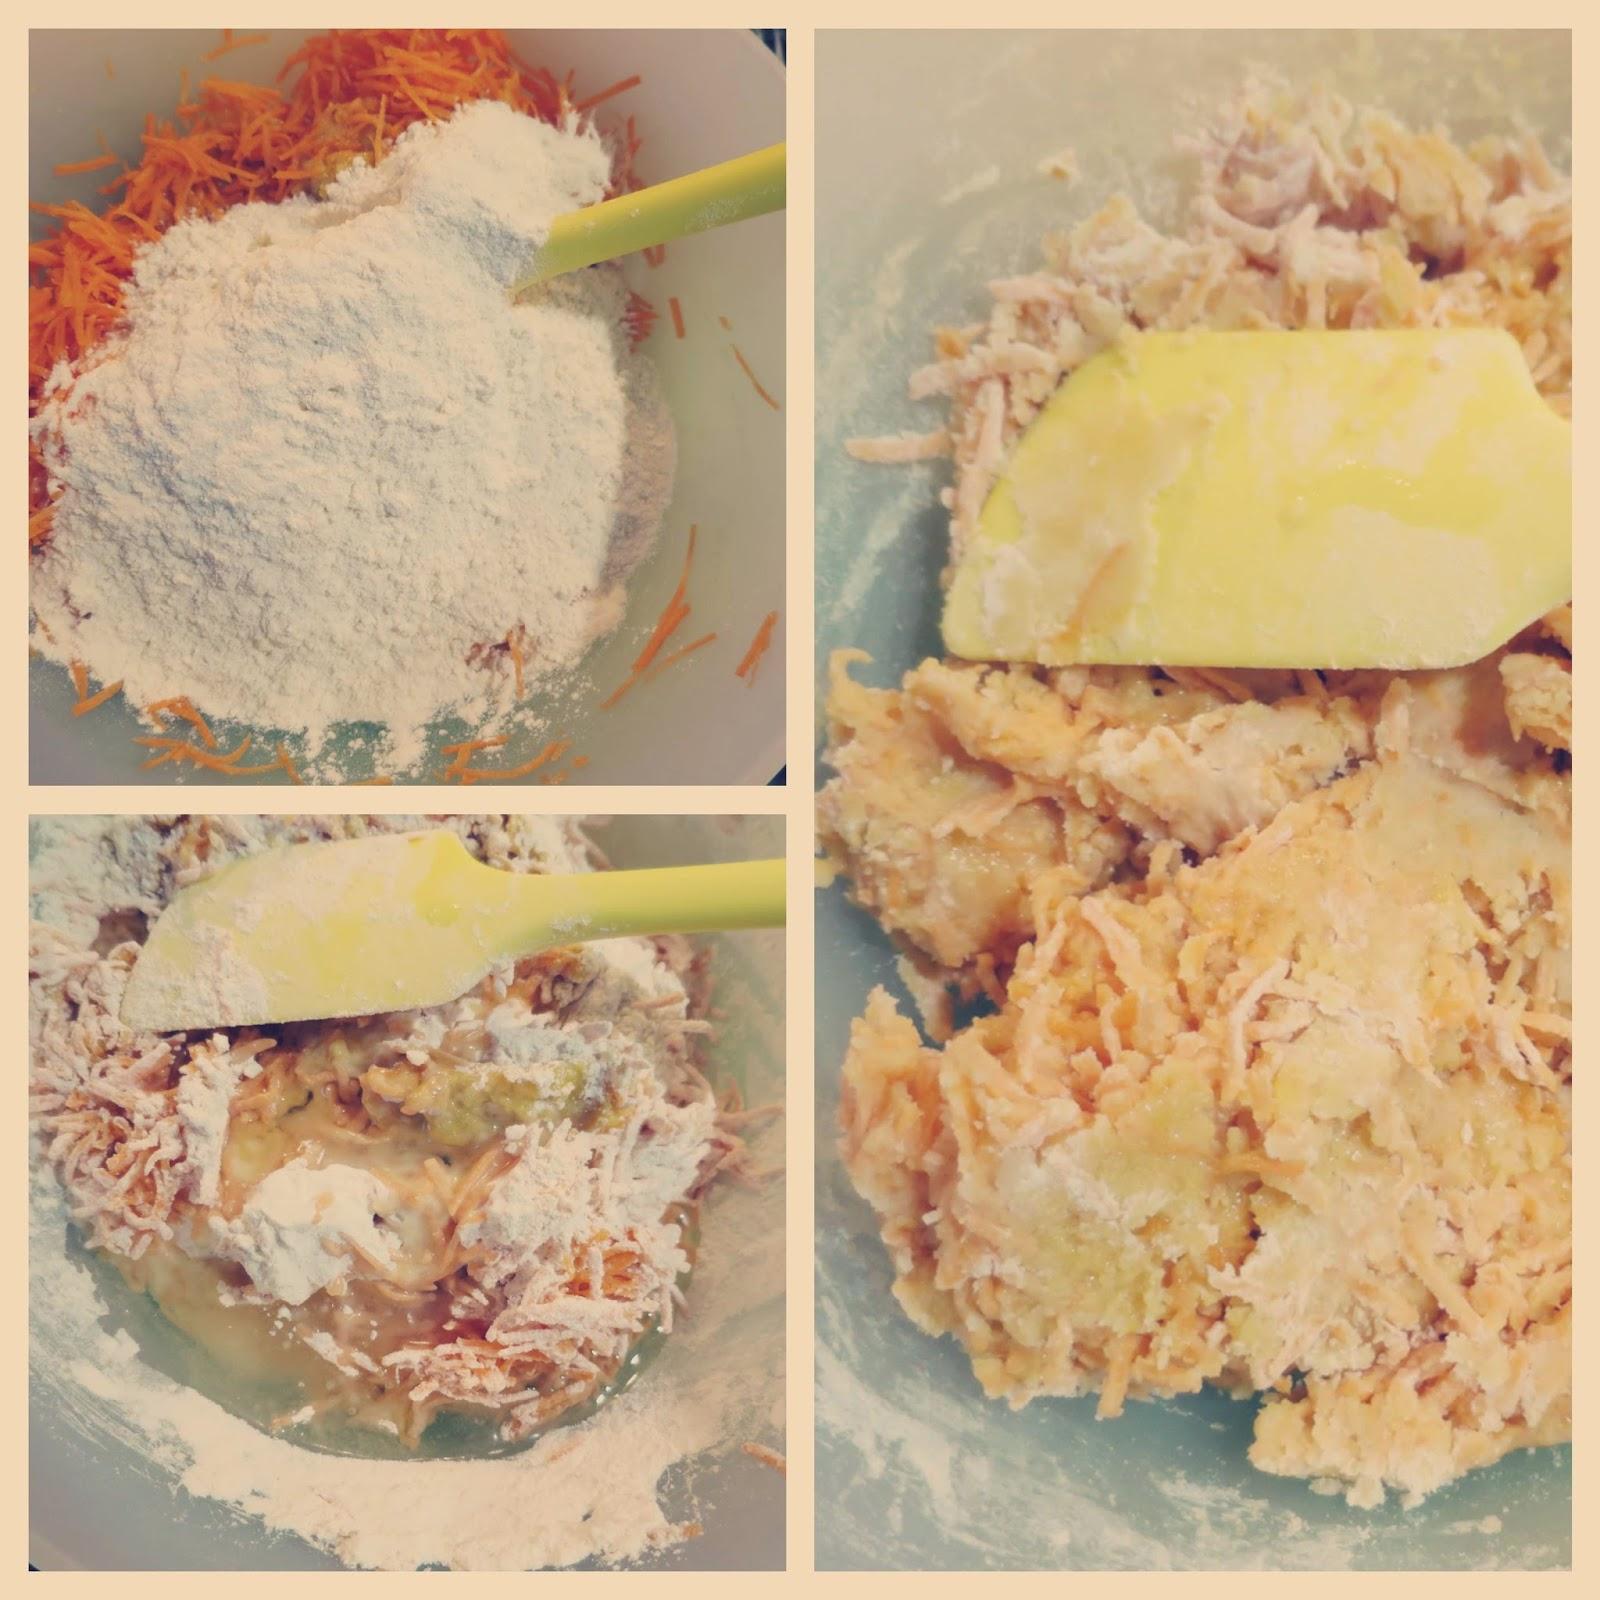 preparazione 2 torta di carote